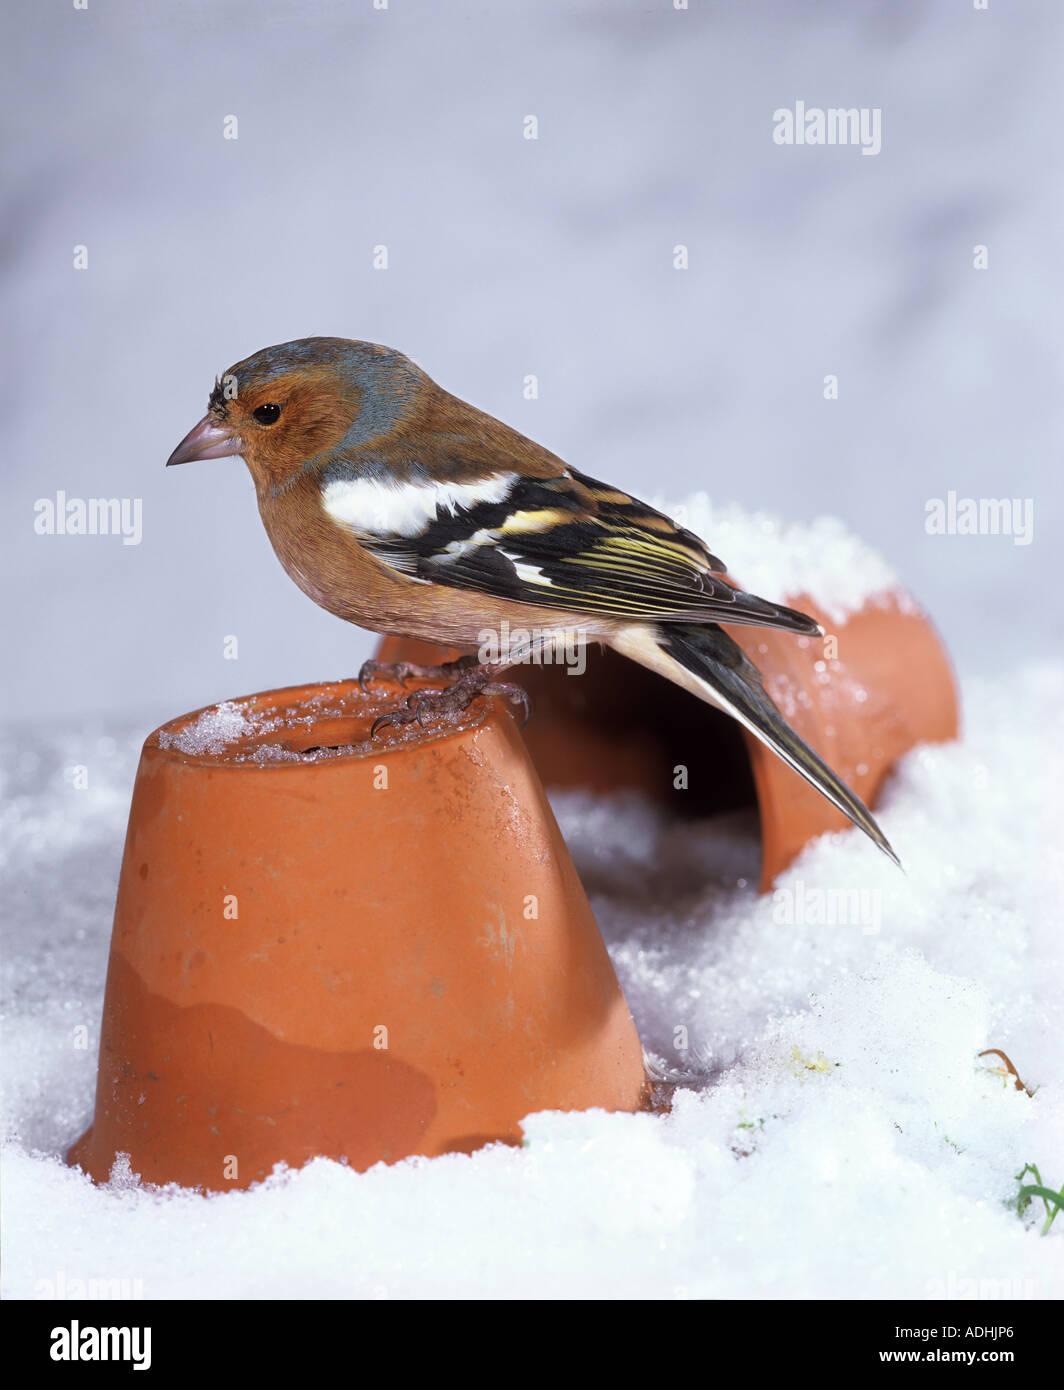 chaffinch in snow Fringilla coelebs - Stock Image